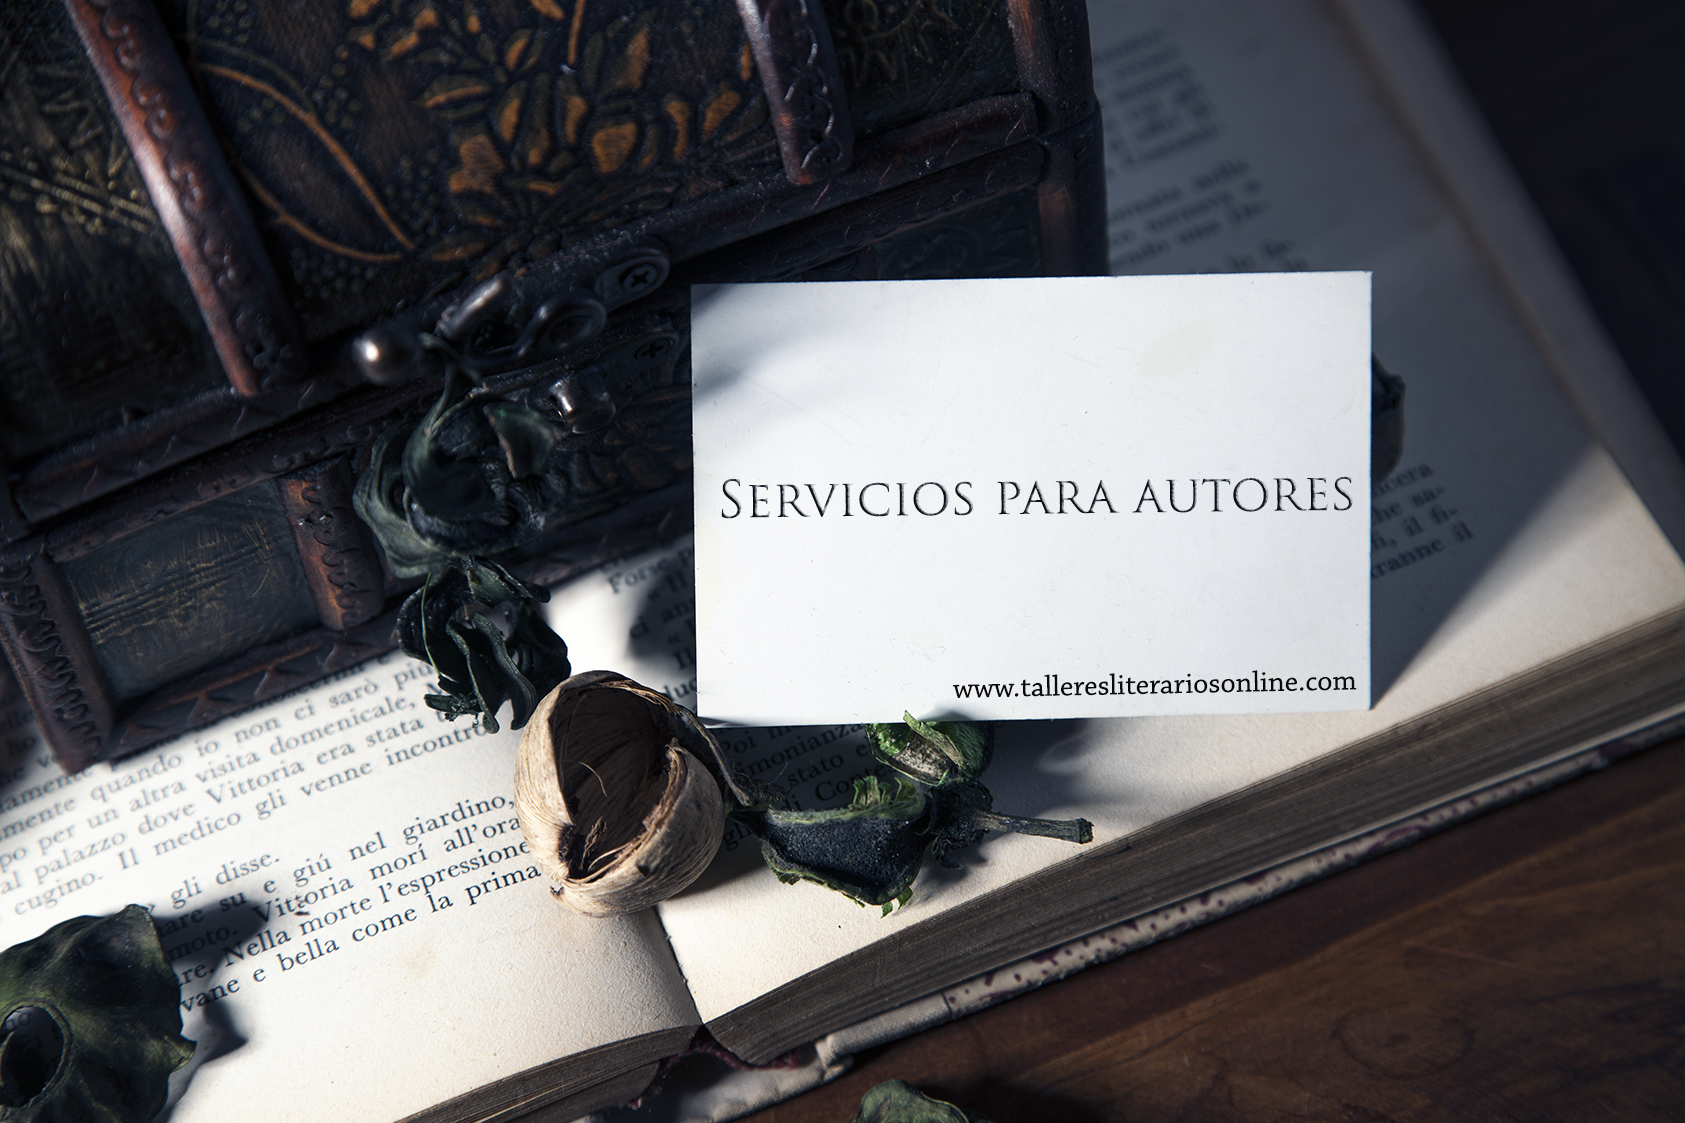 Servicios para autores   Talleres Literarios Online